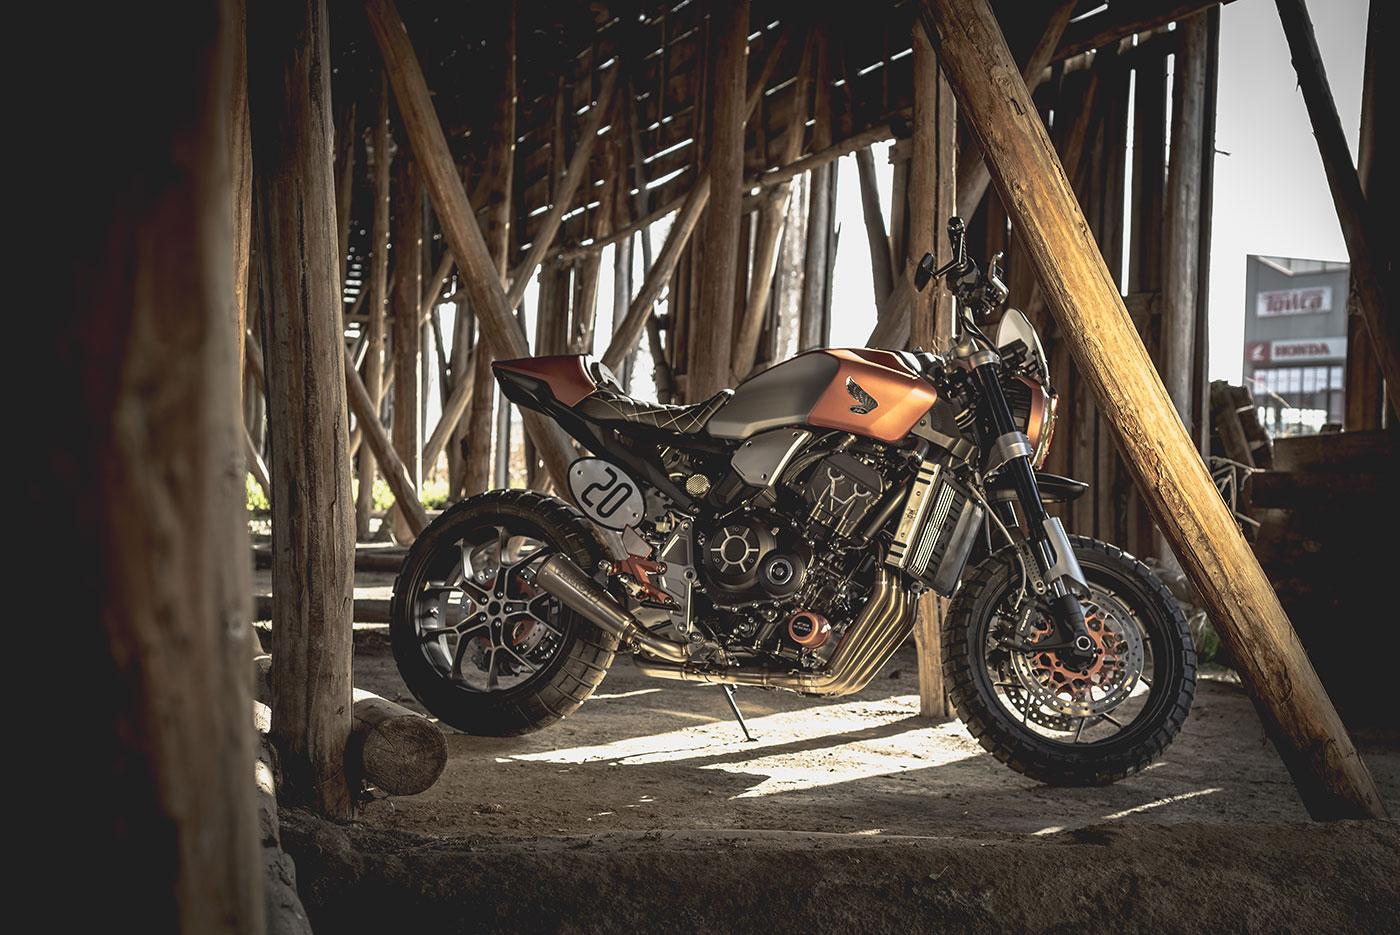 CB1000R. Honda Towca